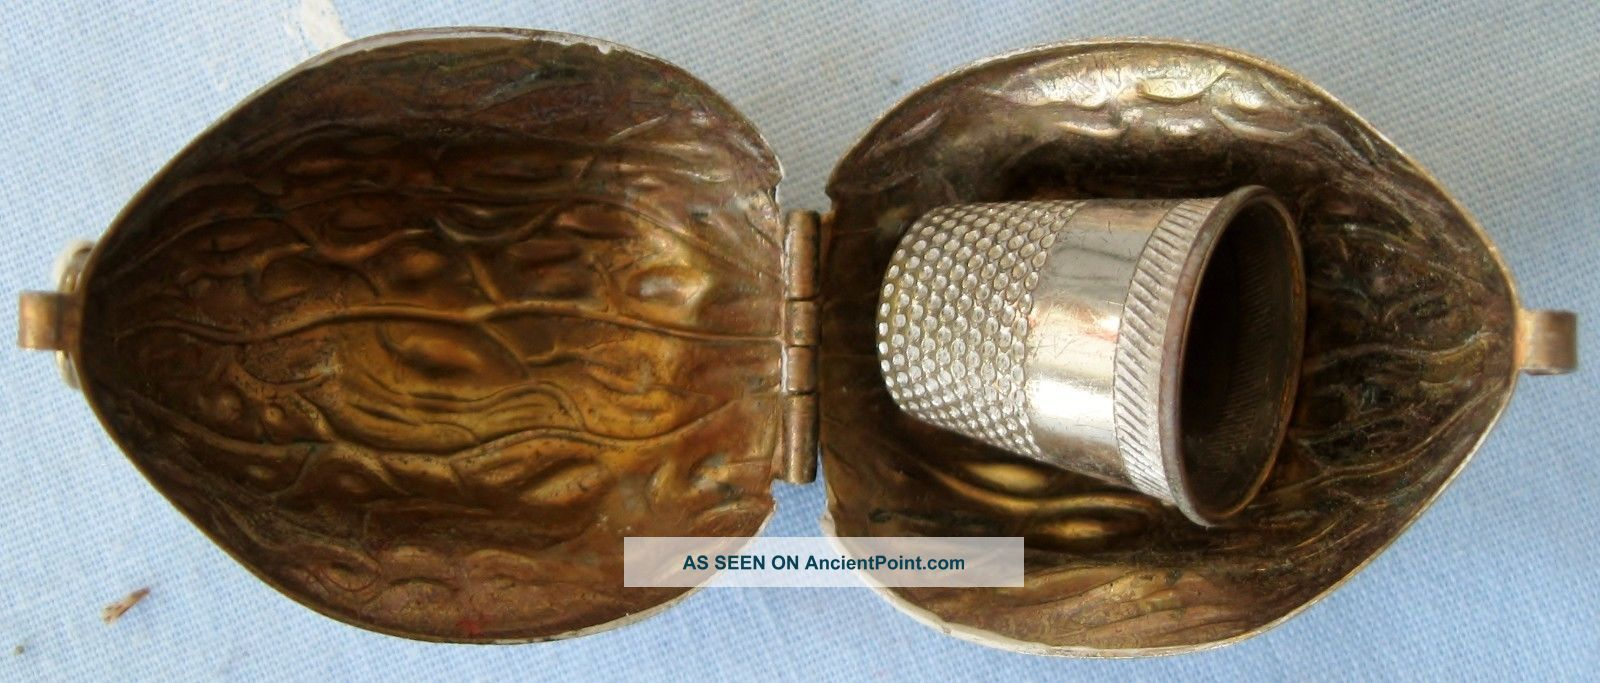 Vintage Sewing Thimble Holder Brass Walnut Shaped Silverplate No.  10 Thimble Thimbles photo